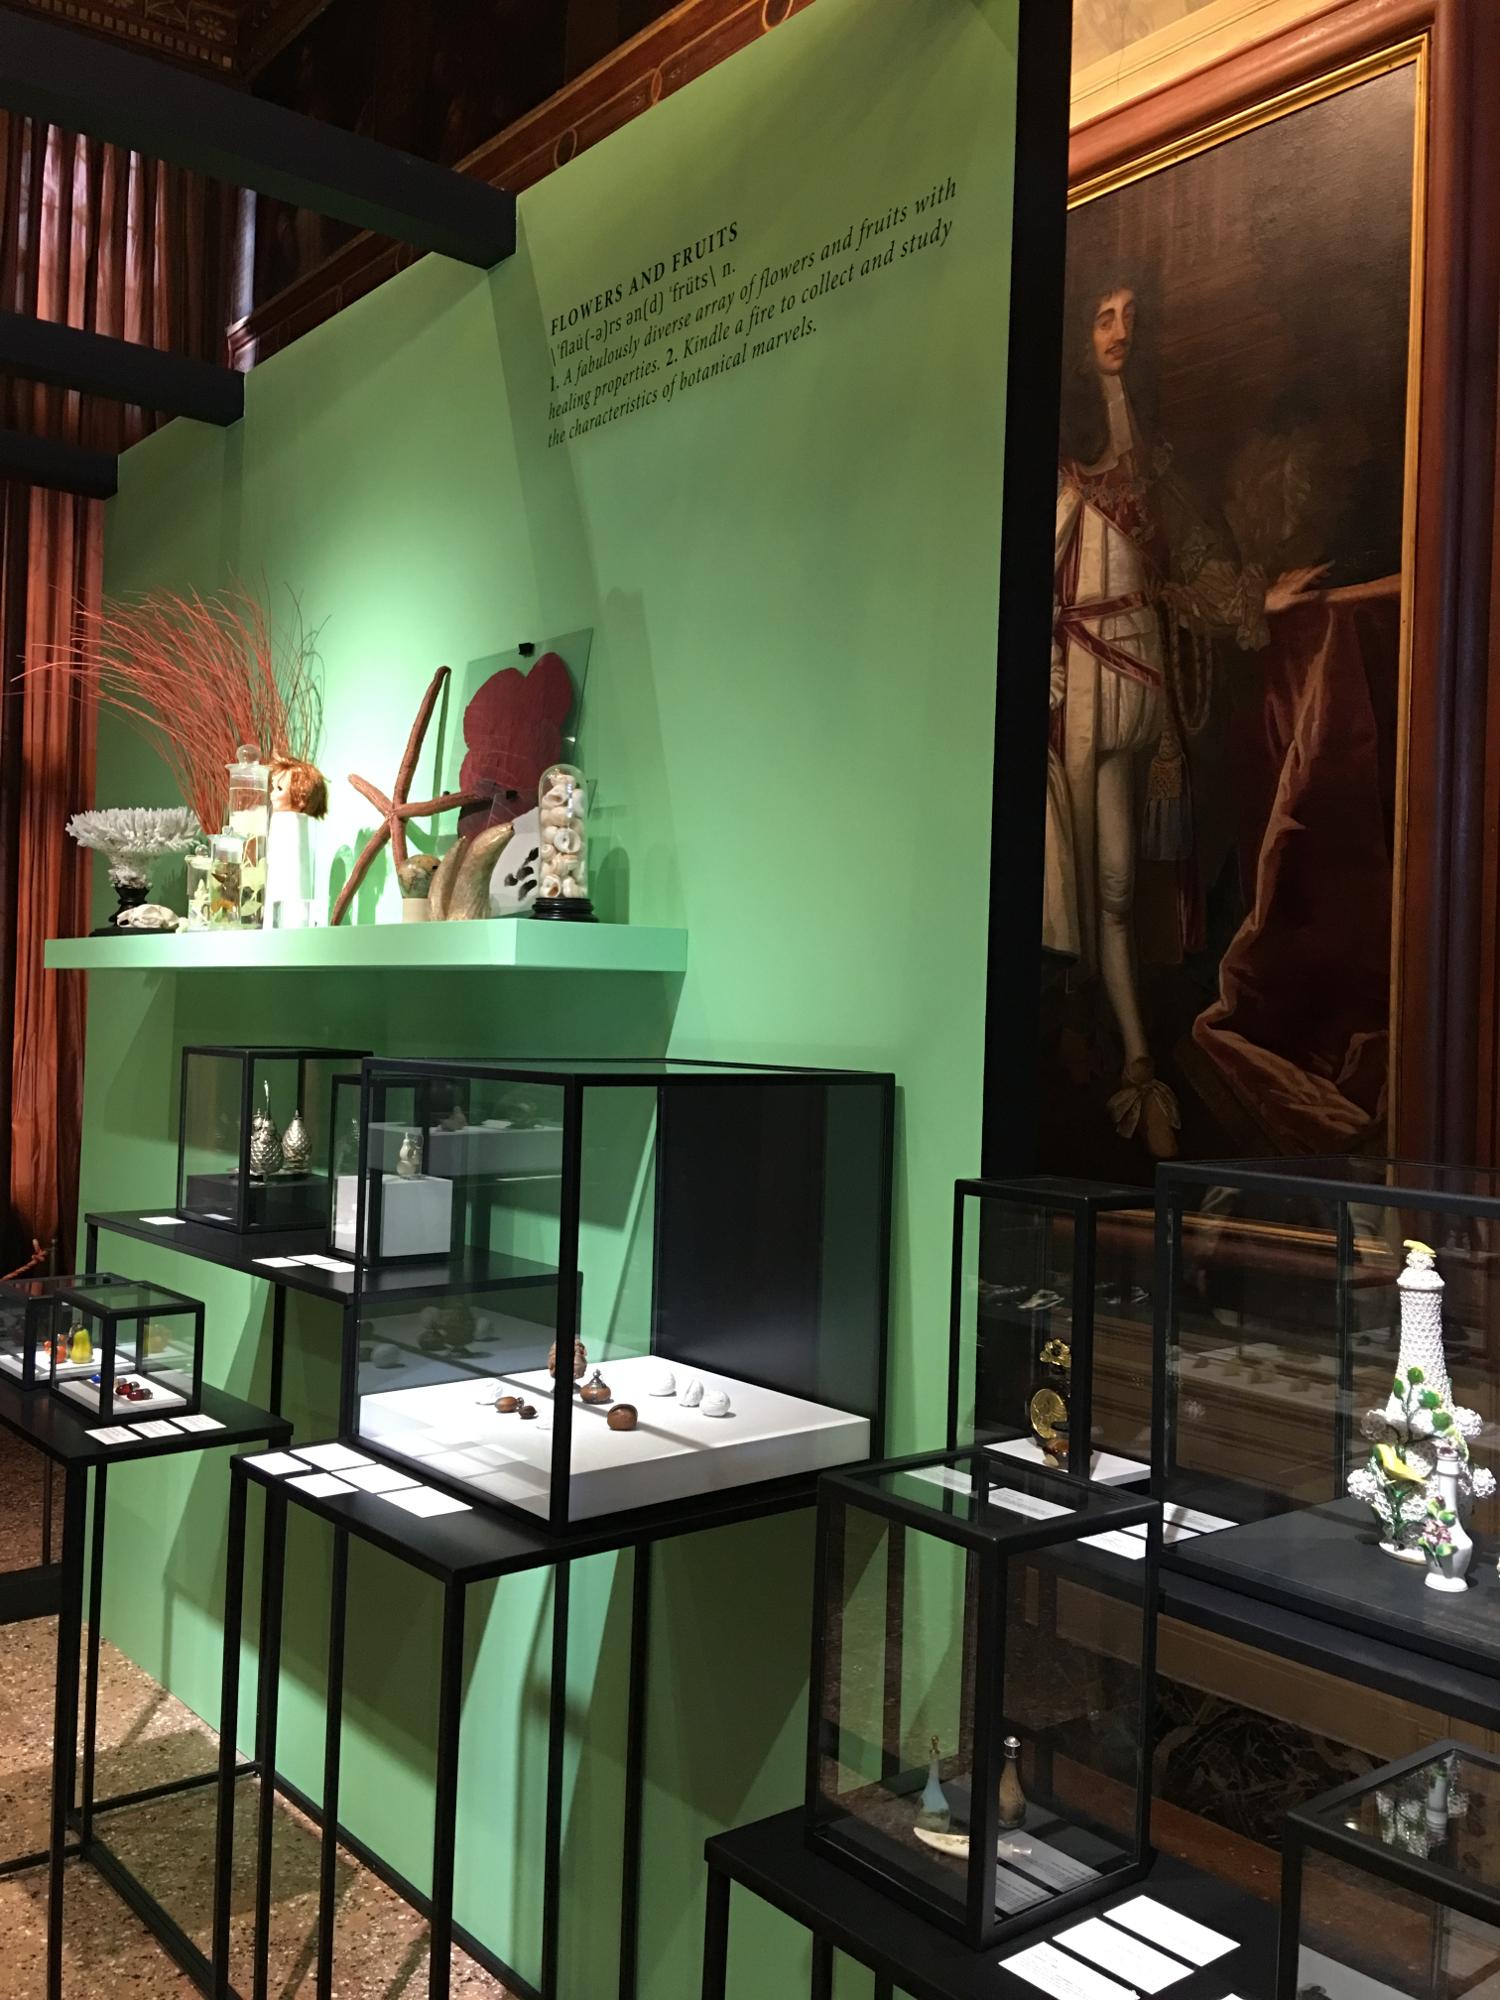 rocaille-blog-venezia-palazzo-mocenigo-cabinet-of-curiosities-collezione-storp-profumo-22